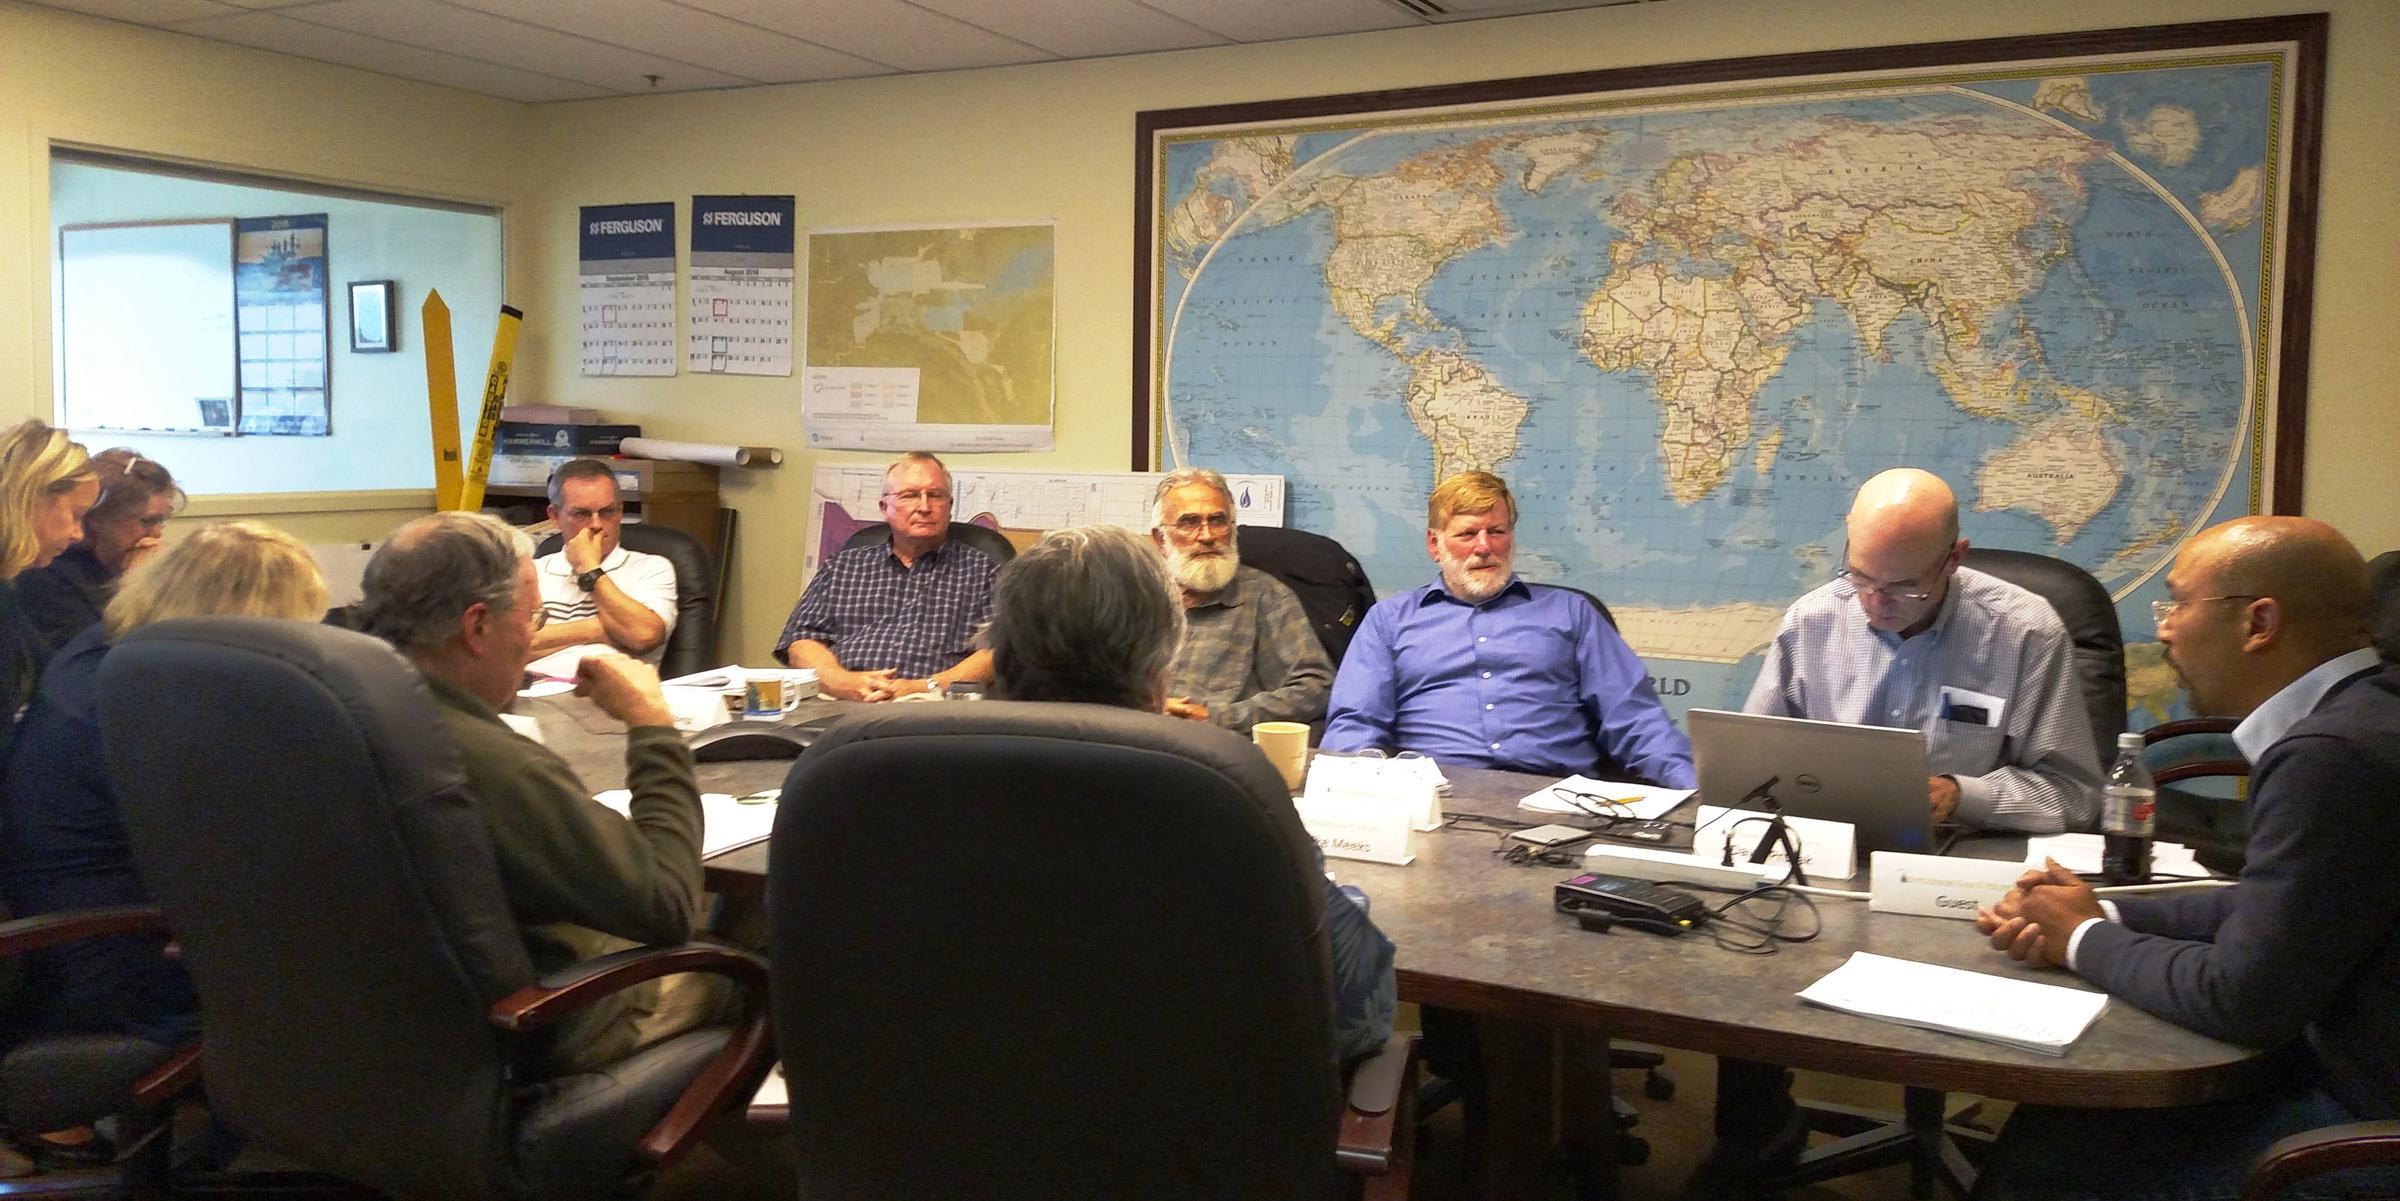 Igu Board Members Resignation Letter Sparks Debate Over Pentex Deal